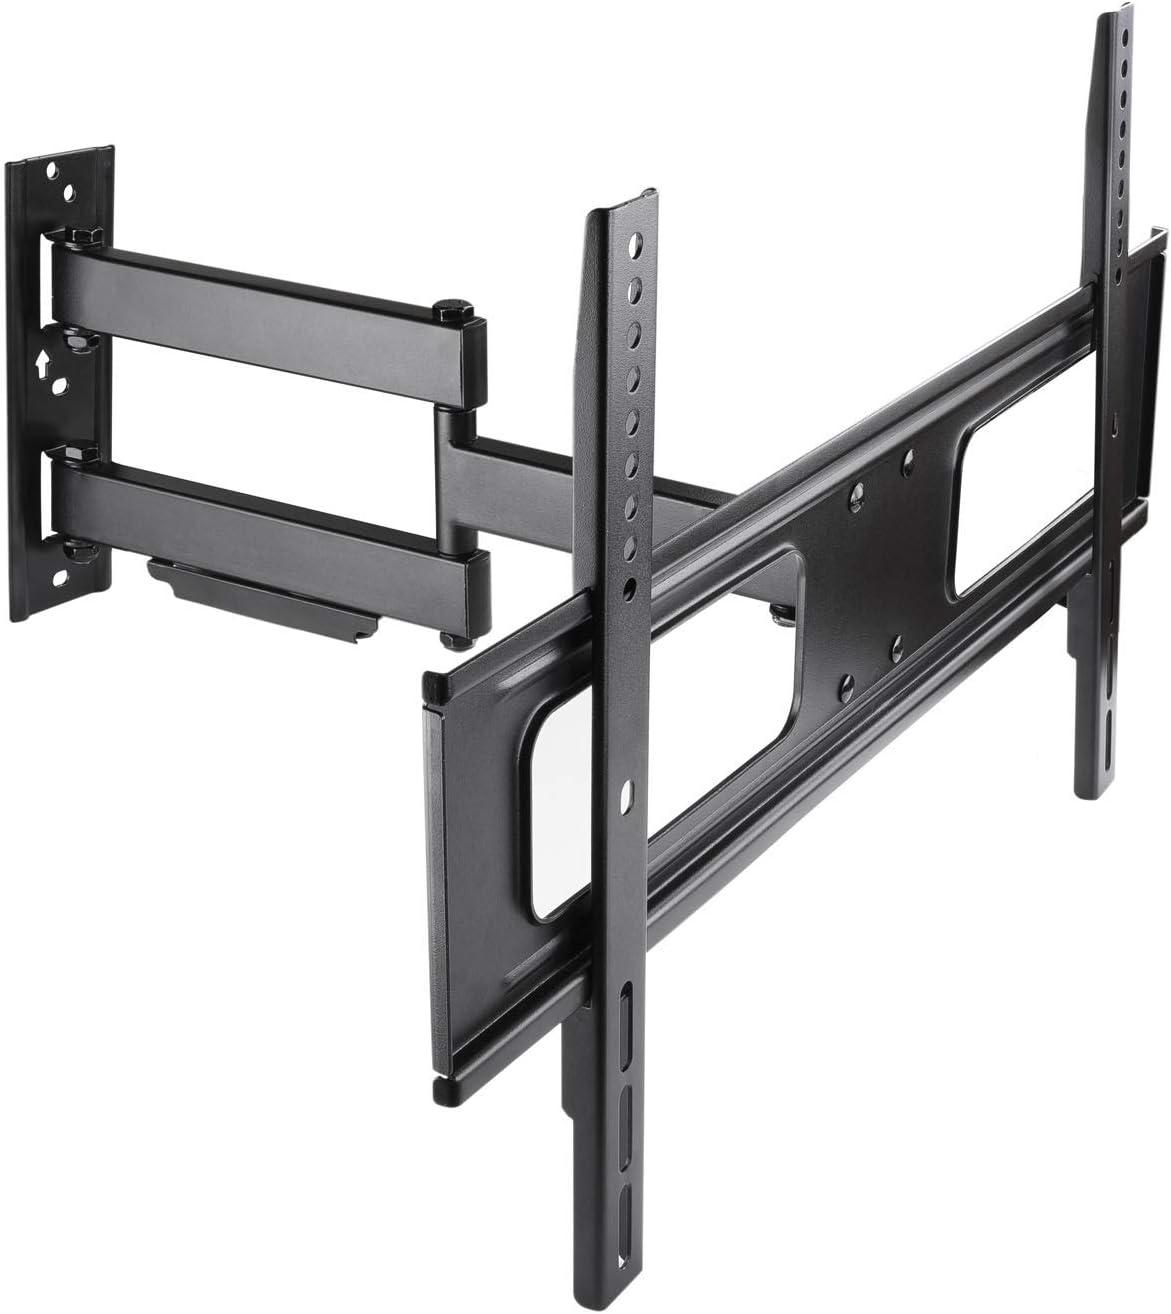 TooQ LP6070TN-B - Soporte fijo inclinable y giratorio de pared para monitor/ TV/LED de 37